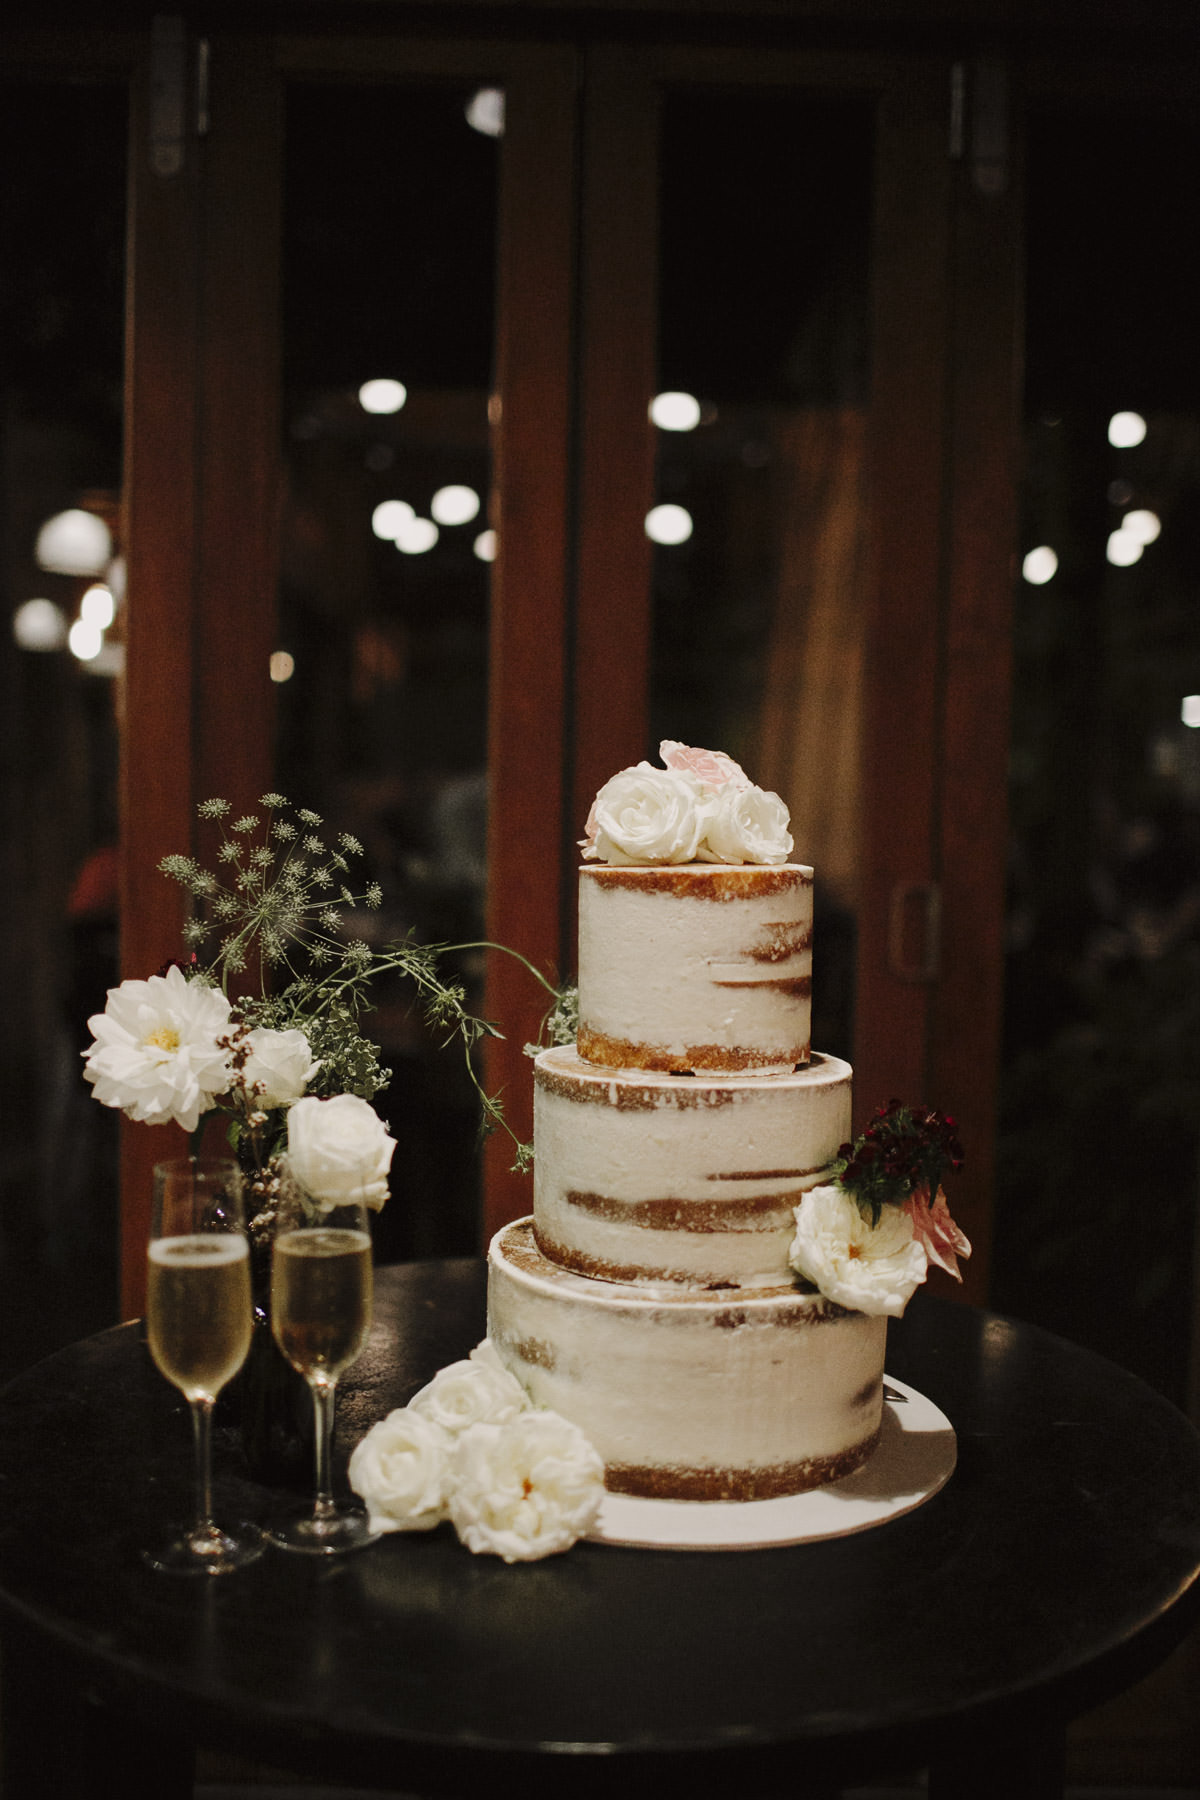 160506_justinaaron_wedding_holly_daniel_pr-298.jpg